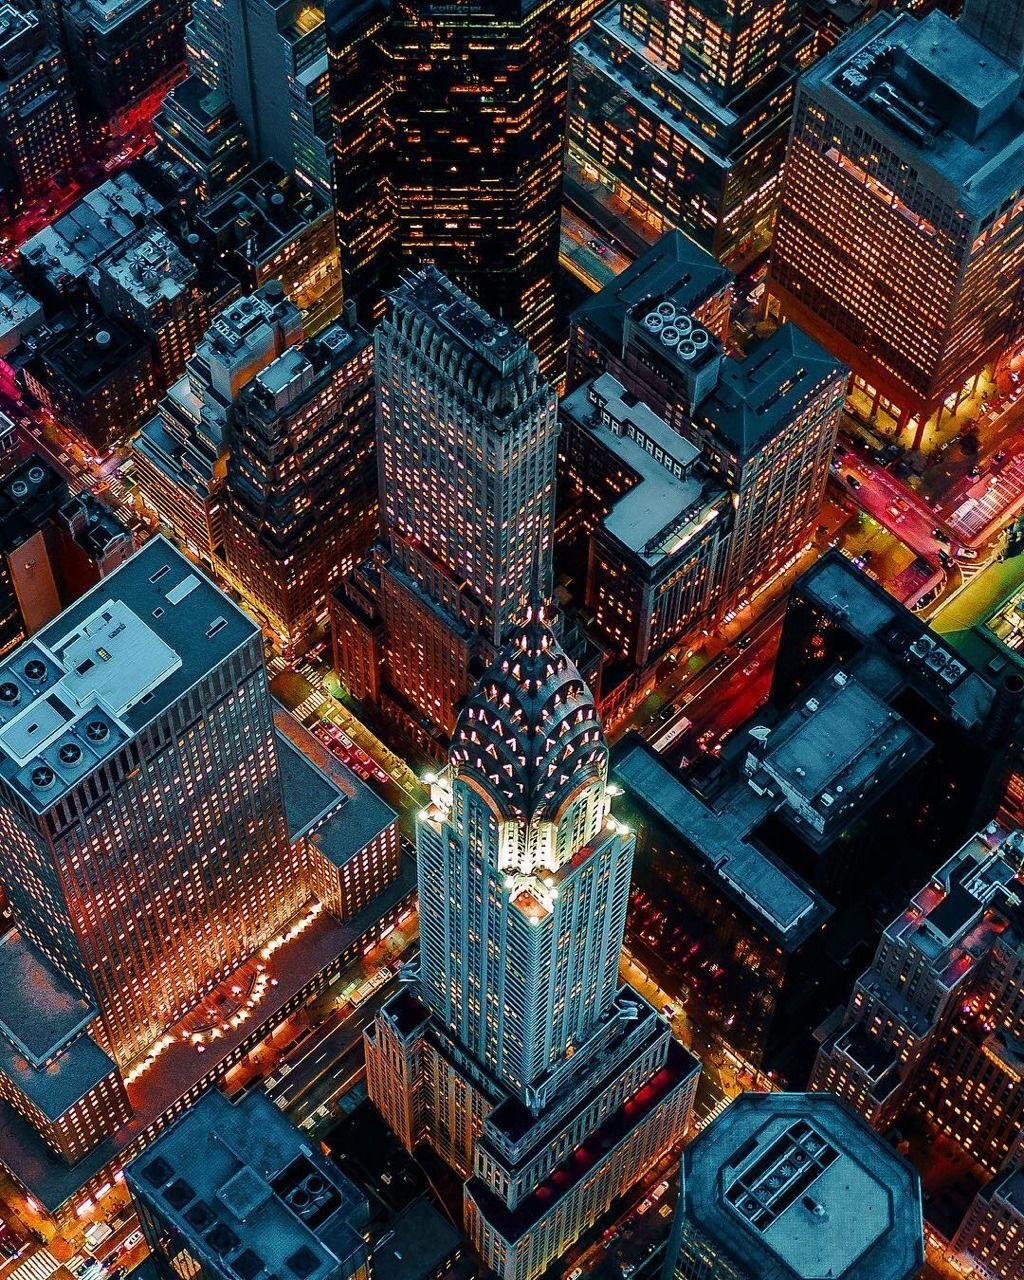 The Chrysler Building At Night By Chris Nova